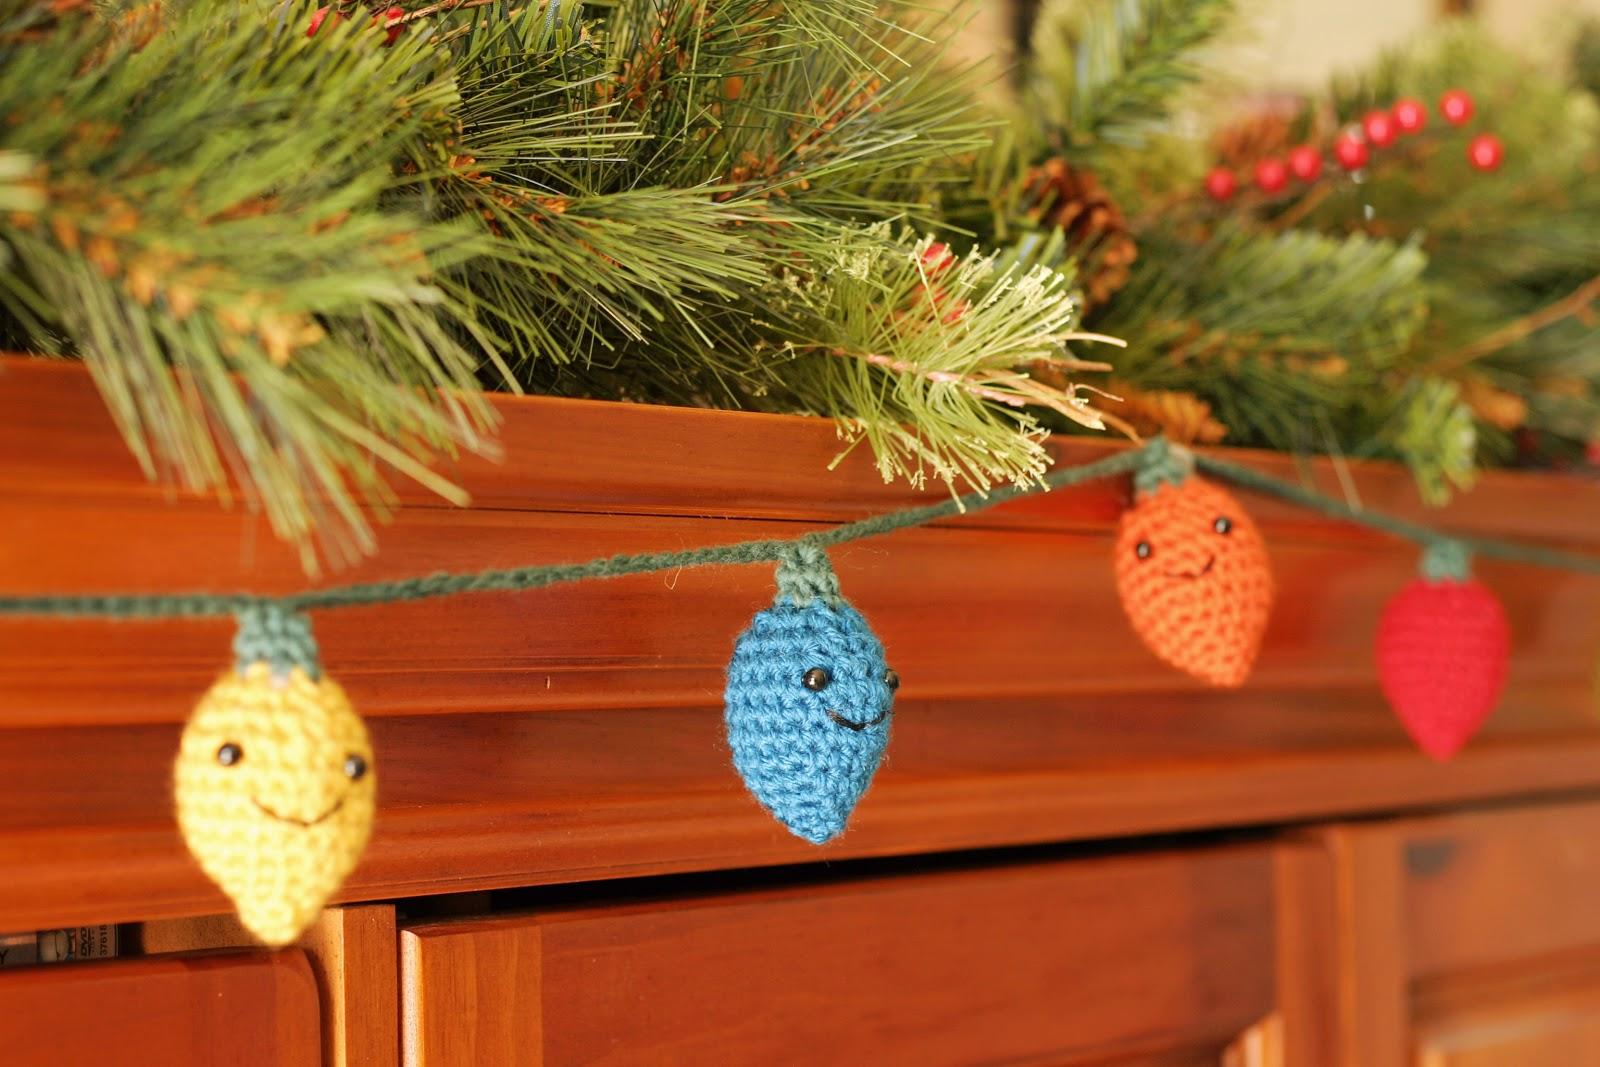 Zelda Amigurumi Patterns : The Dapper Toad: Free Crochet Pattern: Amigurumi Holiday ...